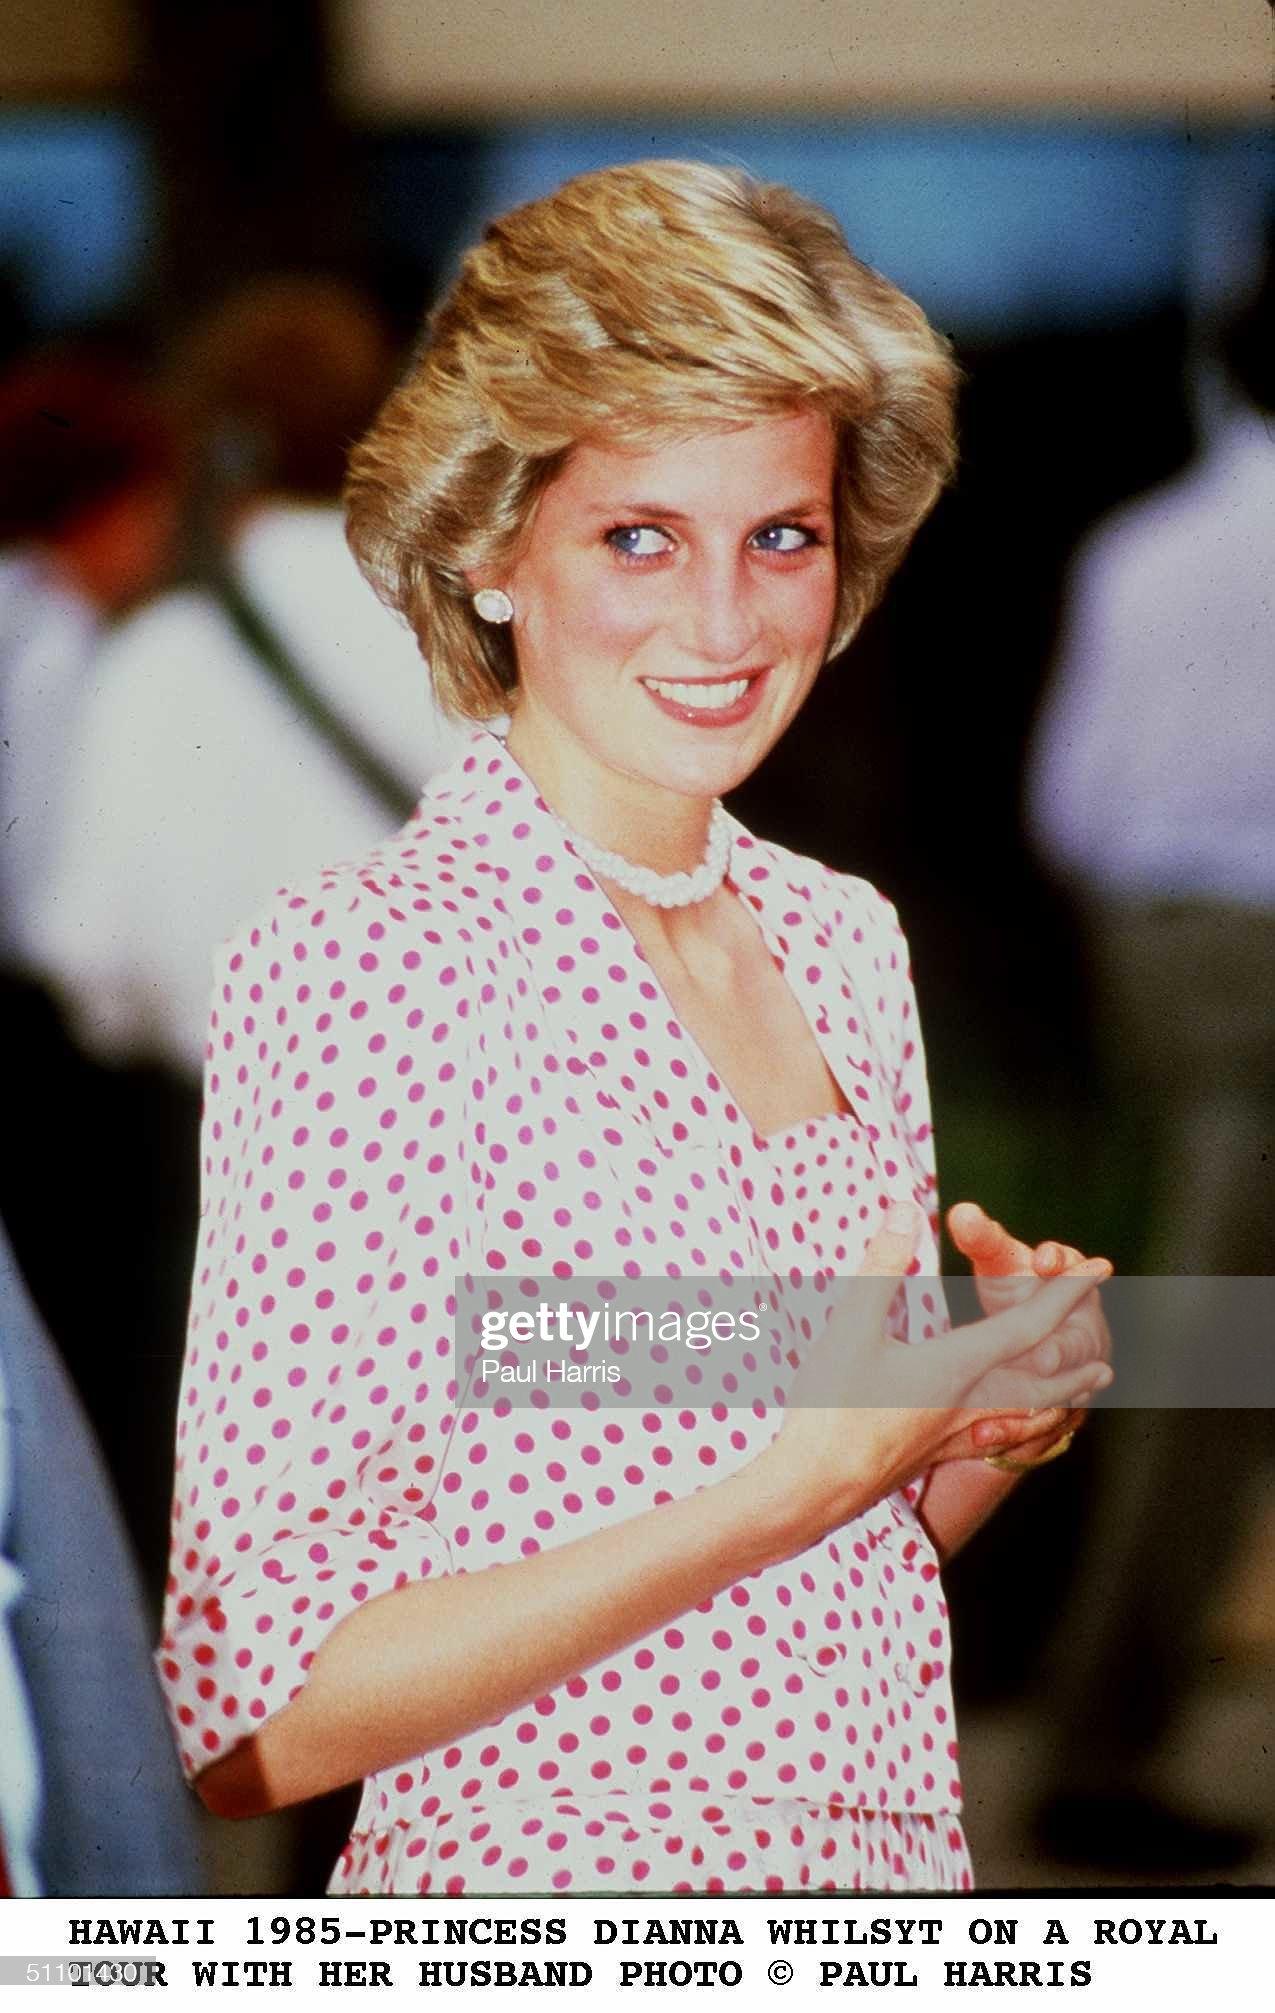 HawaII Princess Diana Whilst On A Royal Tour With Her Husband Paul Harris : News Photo